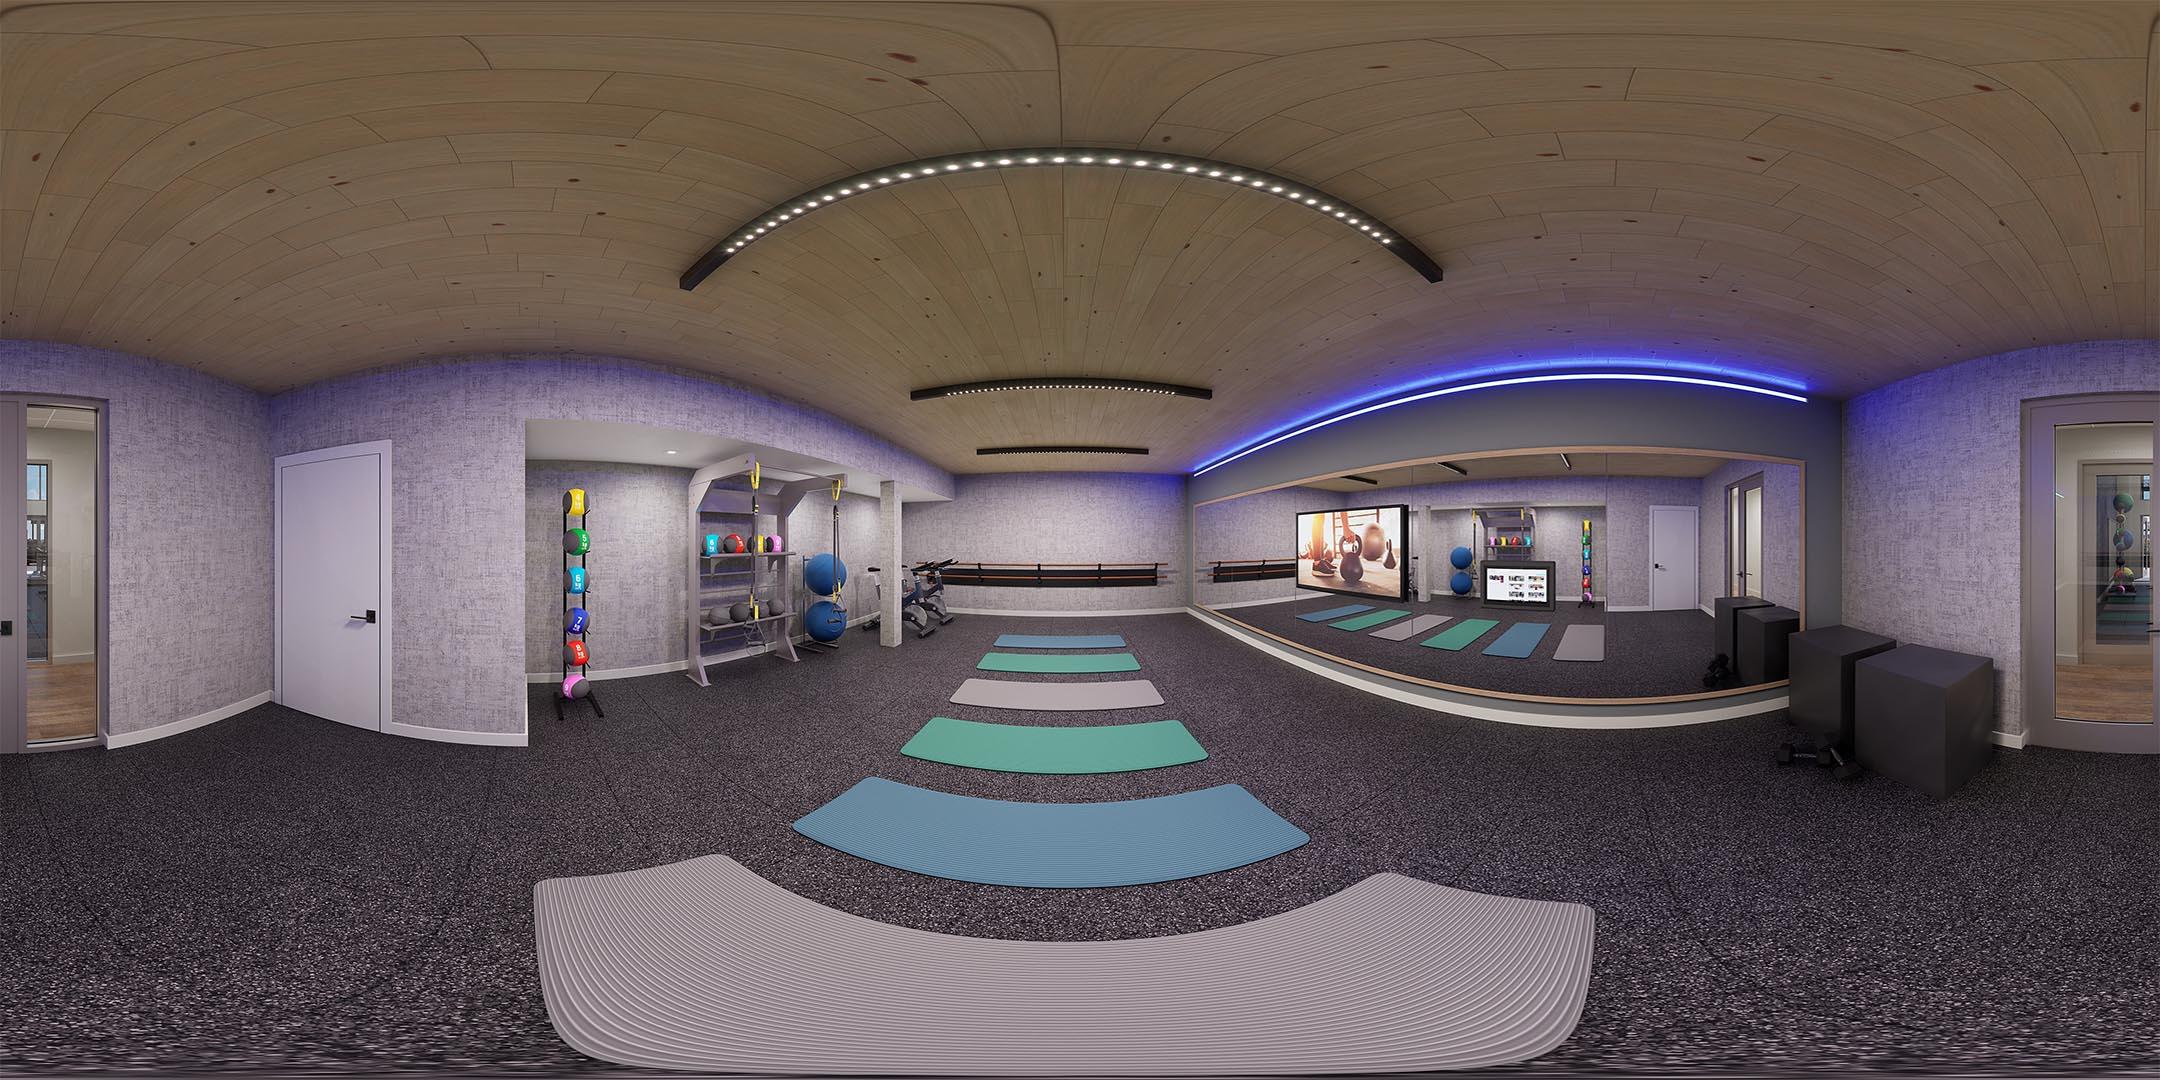 A 360 rendering of a yoga studio